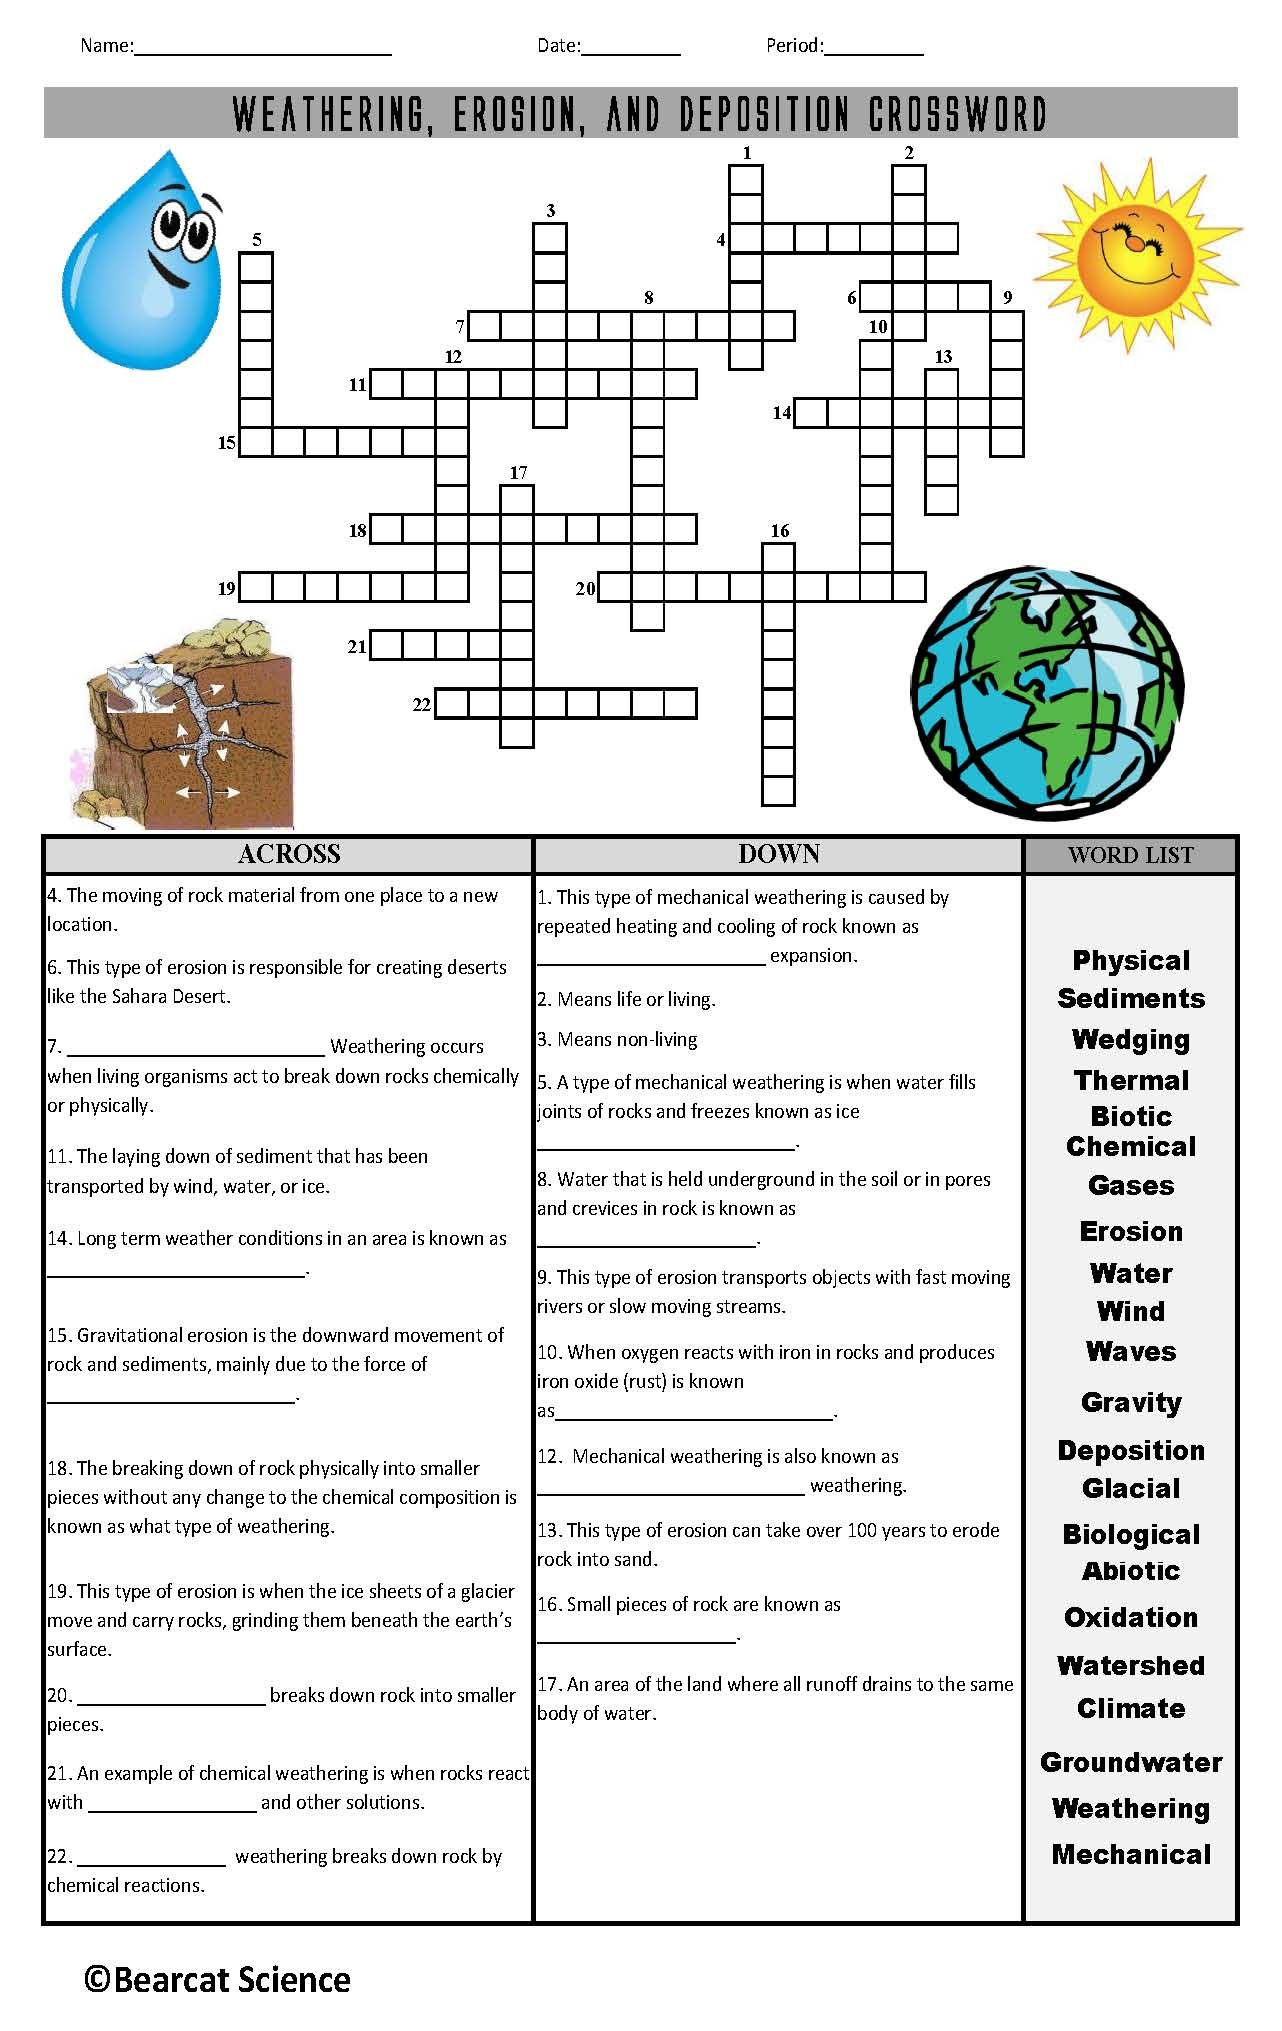 Weathering Erosion And Deposition Crossword Puzzle Crossword